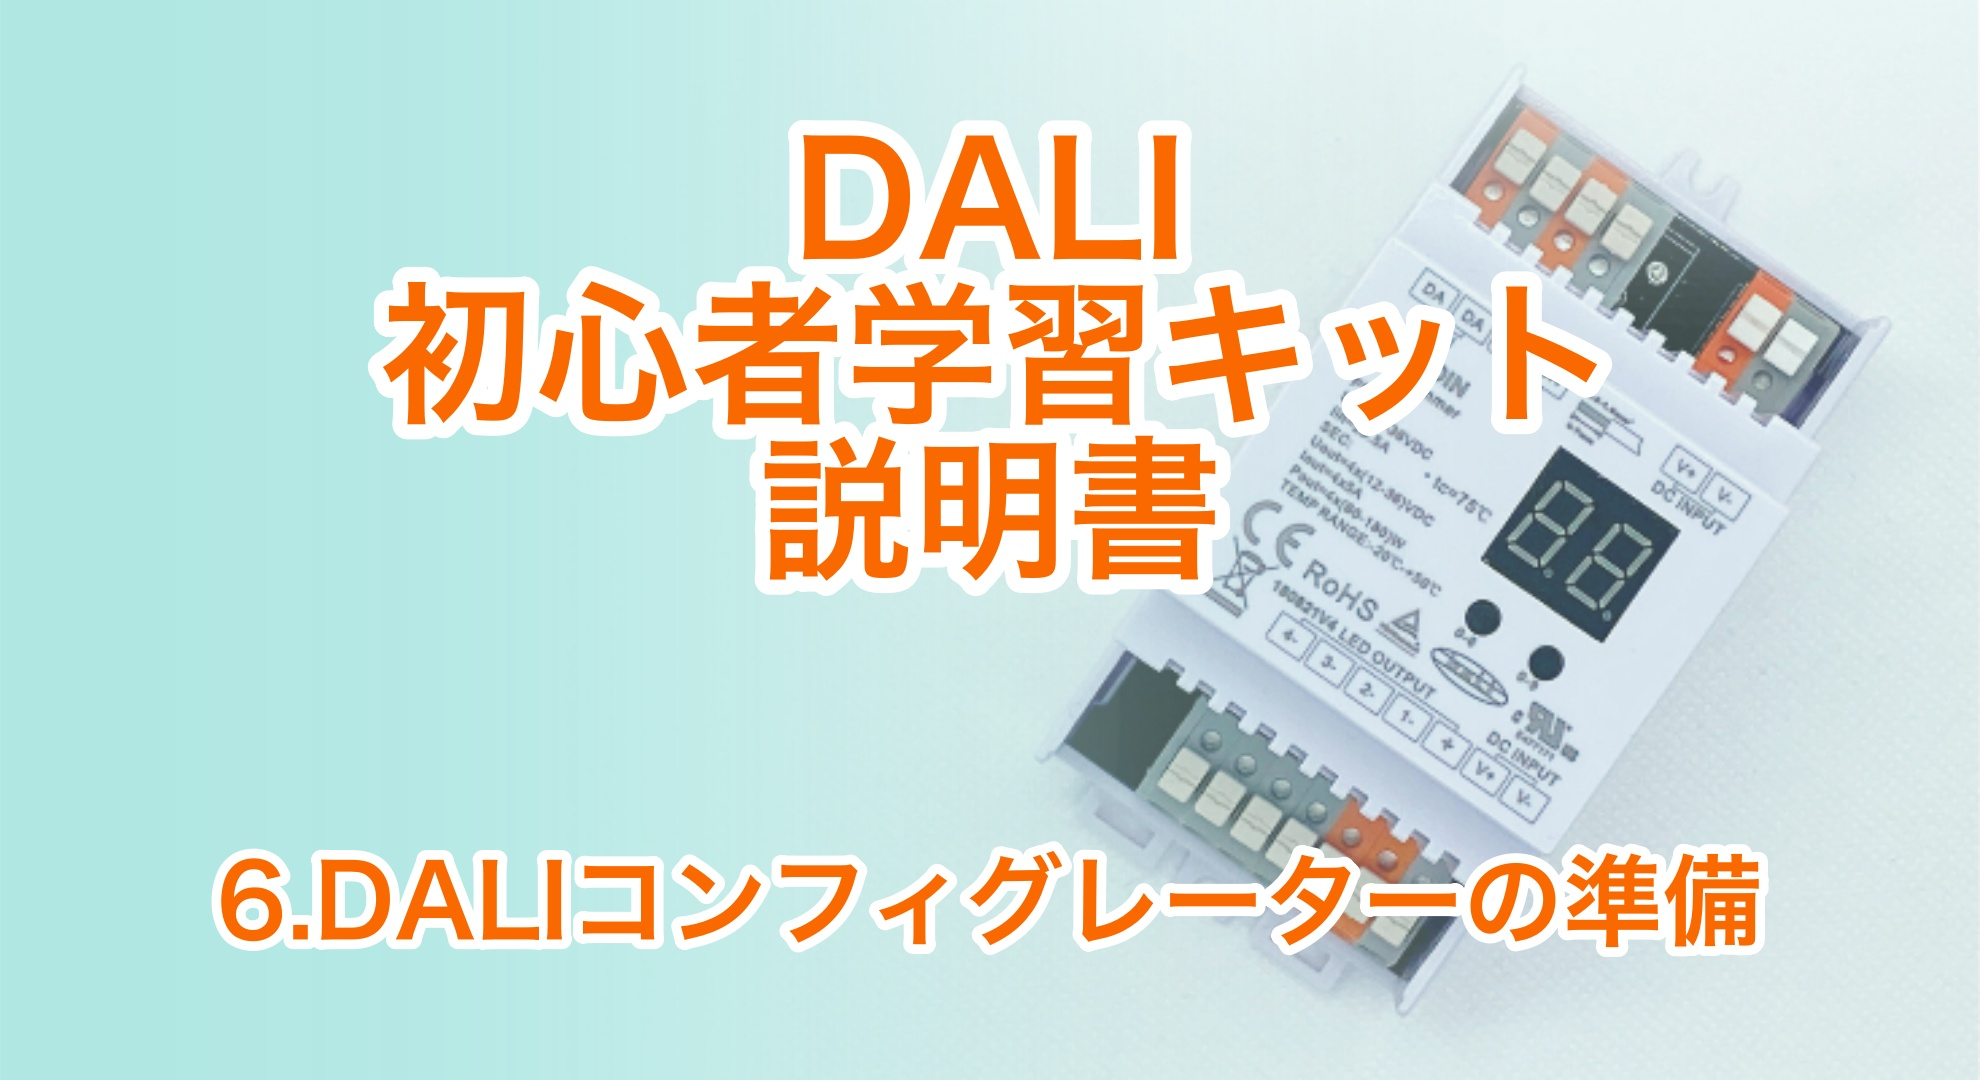 DALI初心者学習キット説明書 6.DALIコンフィグレーターの準備